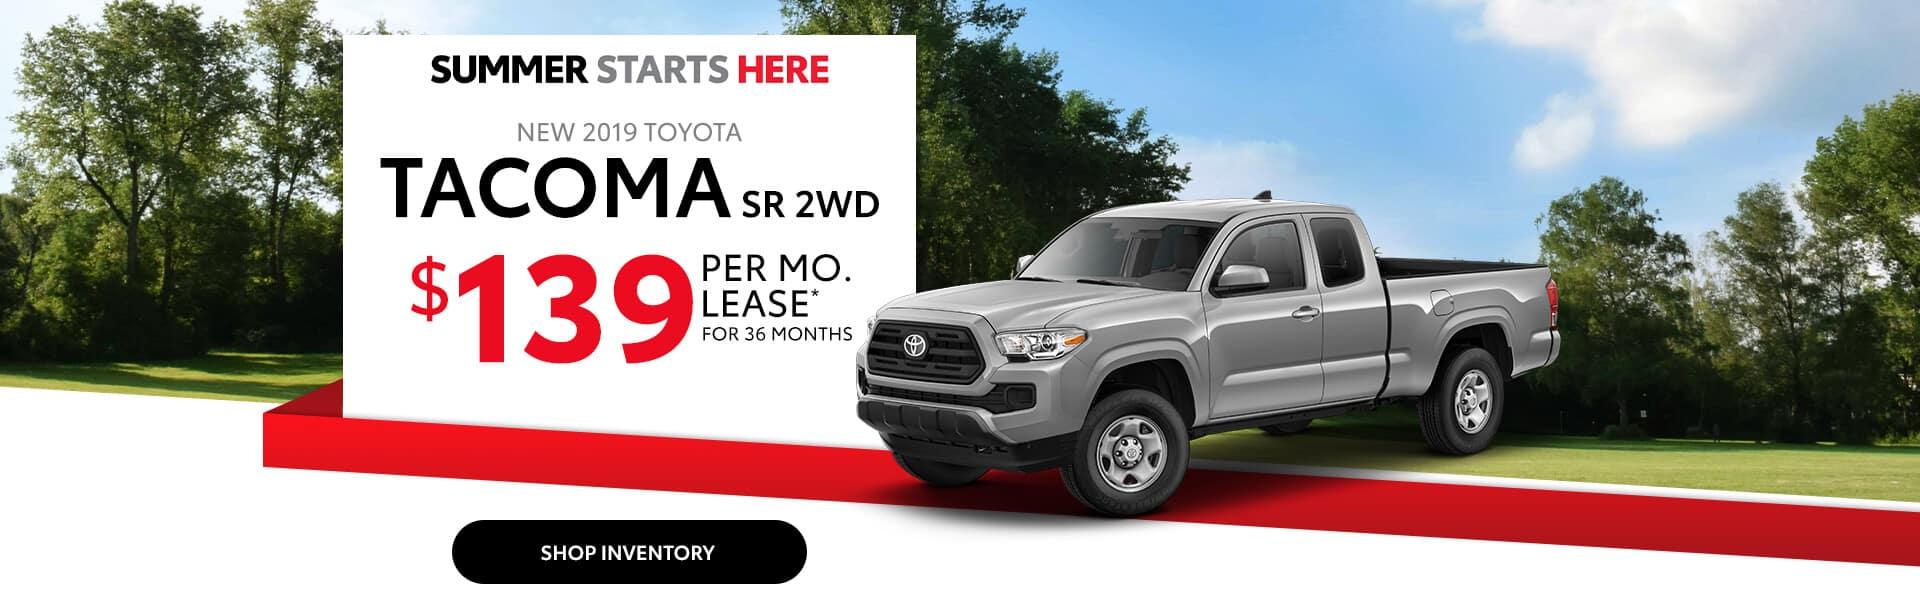 Best Deal on a Toyota Tacoma near Avon, Indiana.